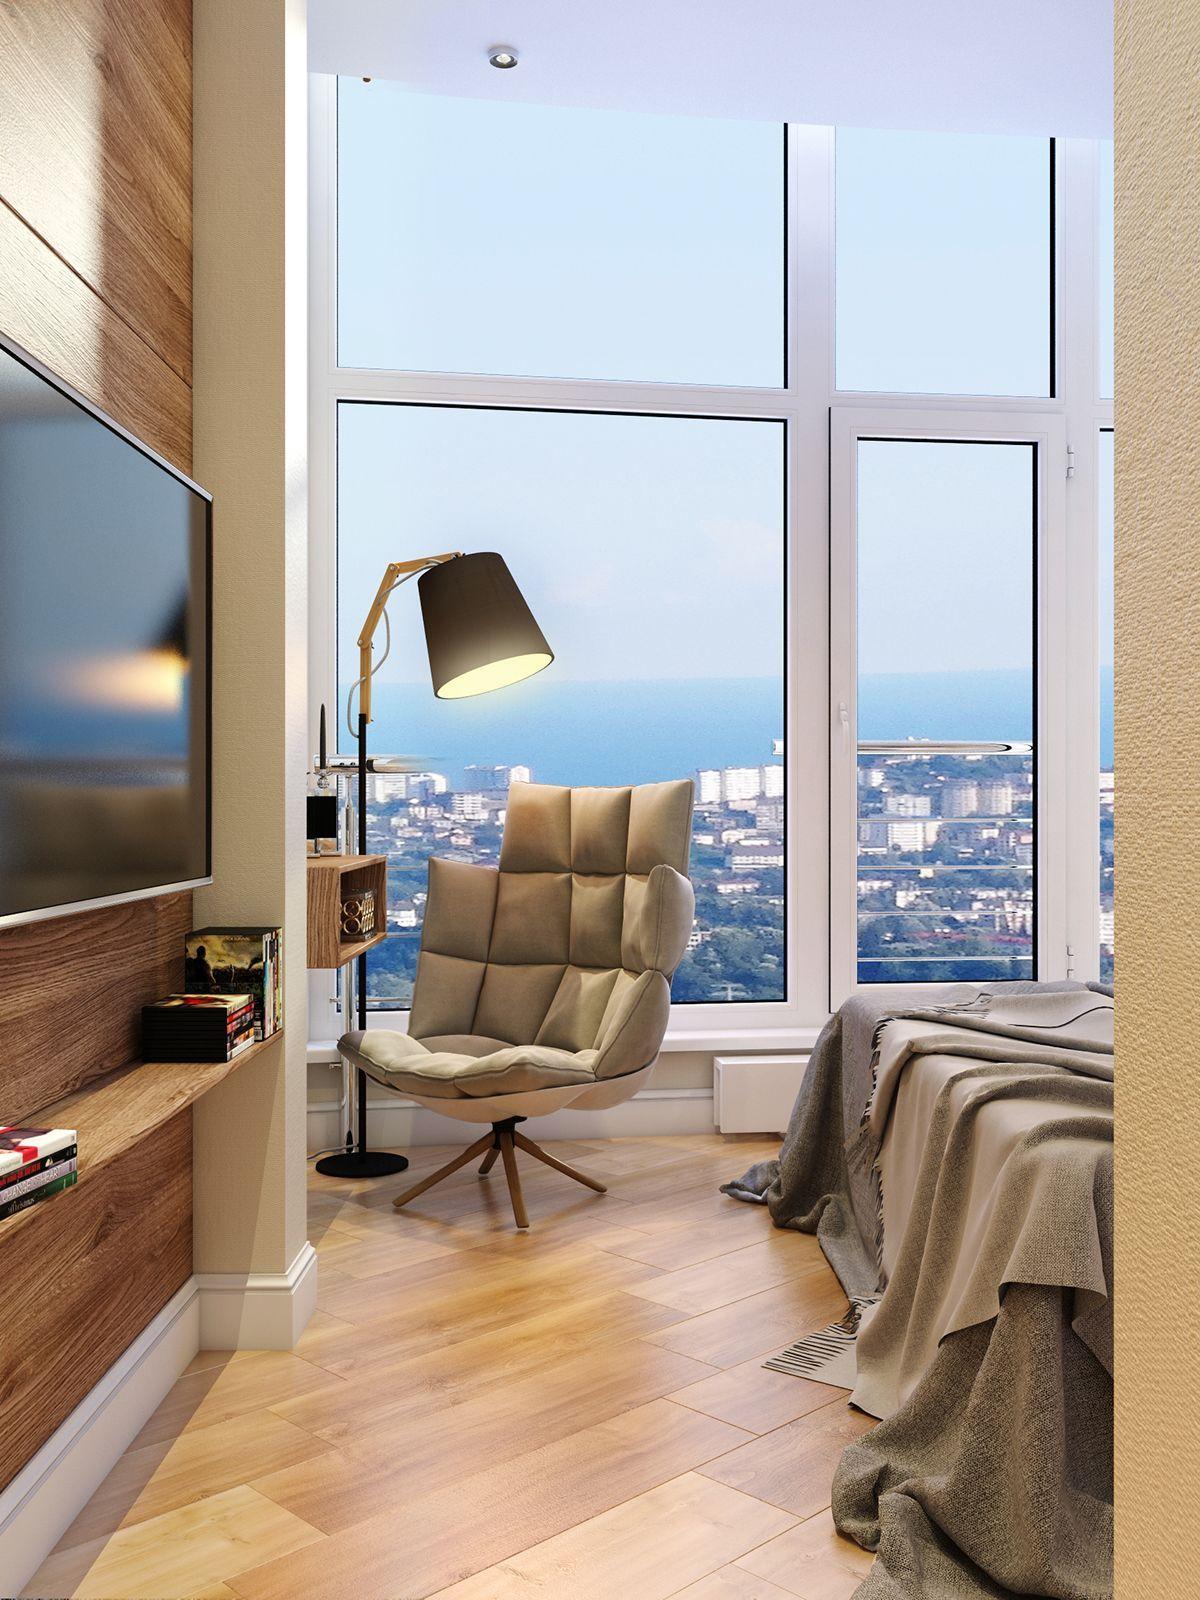 4 Duplex Lofts With Massive Windows Home Designs Inspirations